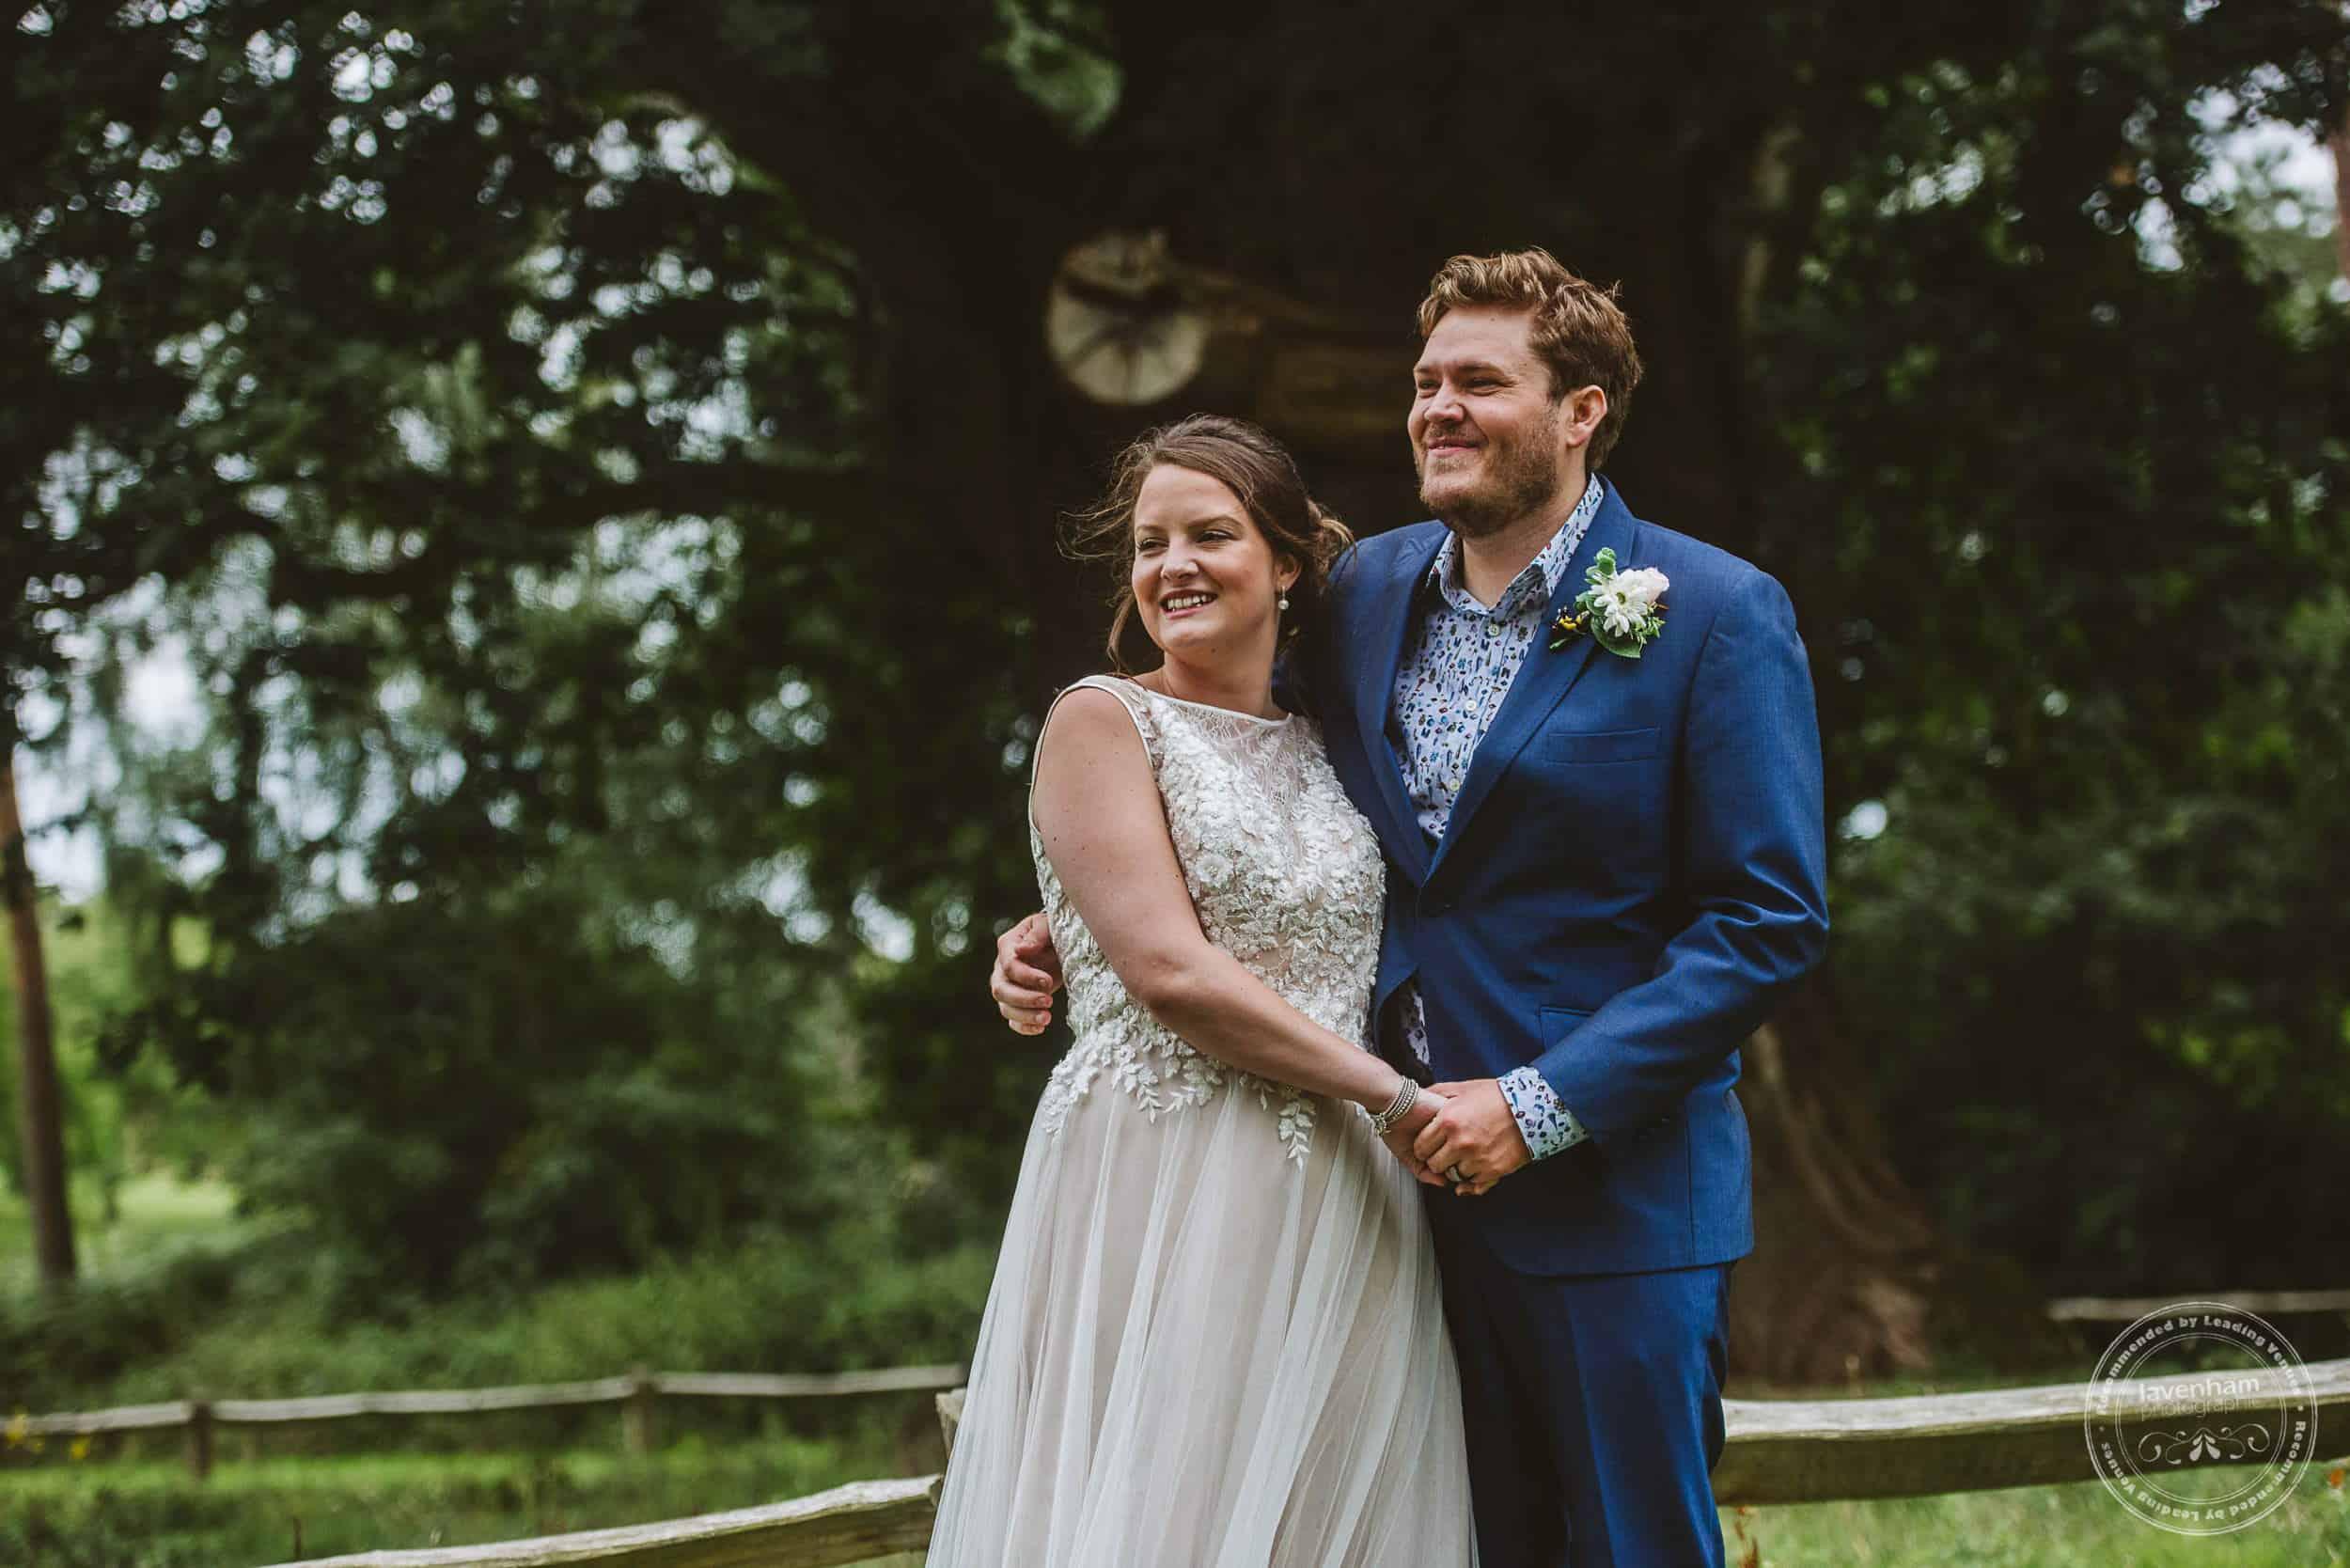 180818 Marks Hall Wedding Photography Lavenham Photographic 102